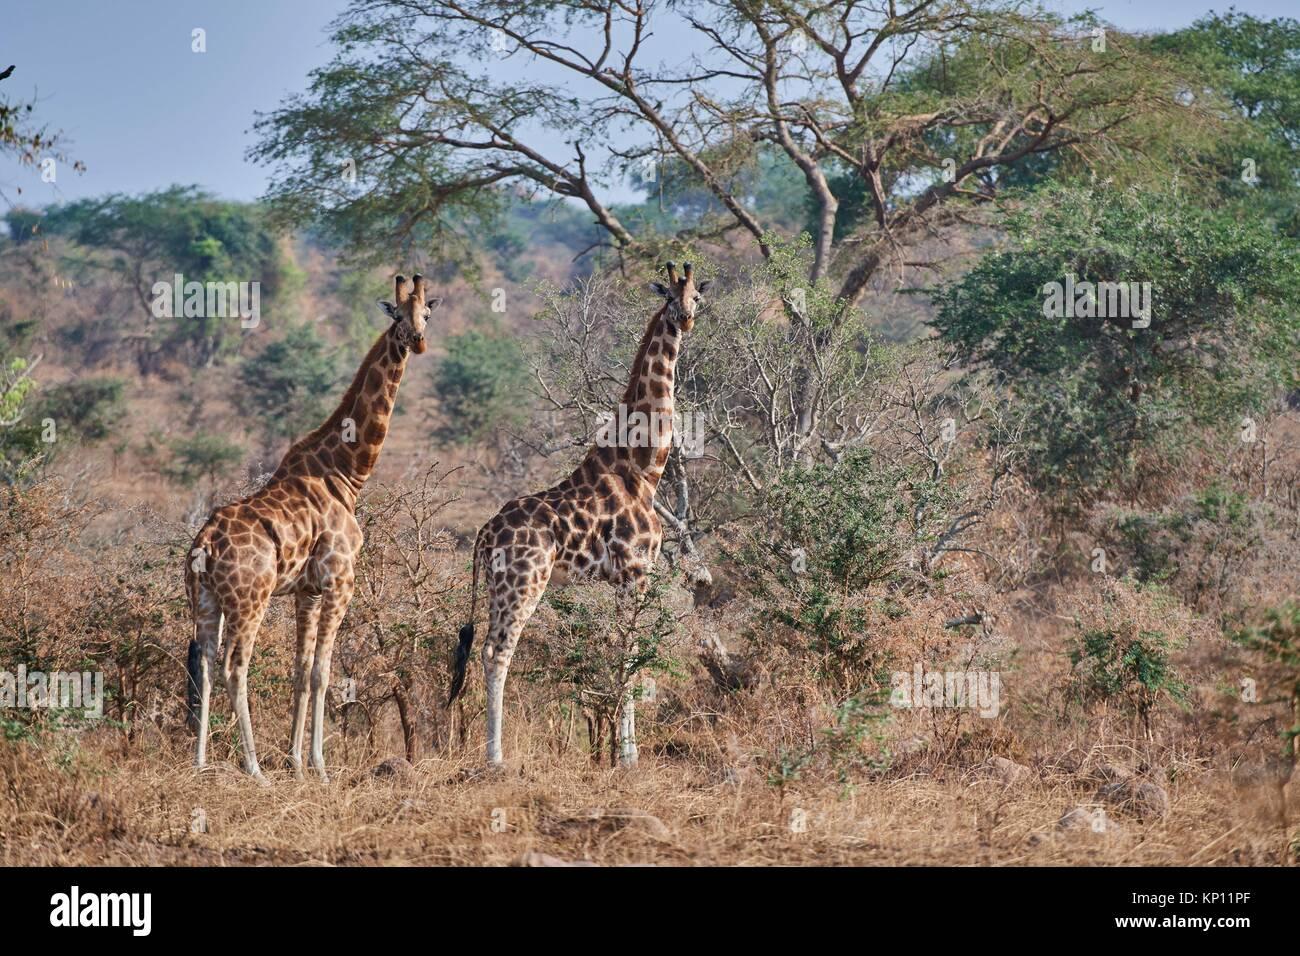 Rothschild's giraffe (Giraffa camelopardalis rothschildi) in Murchisson Falls National Park, Uganda. - Stock Image